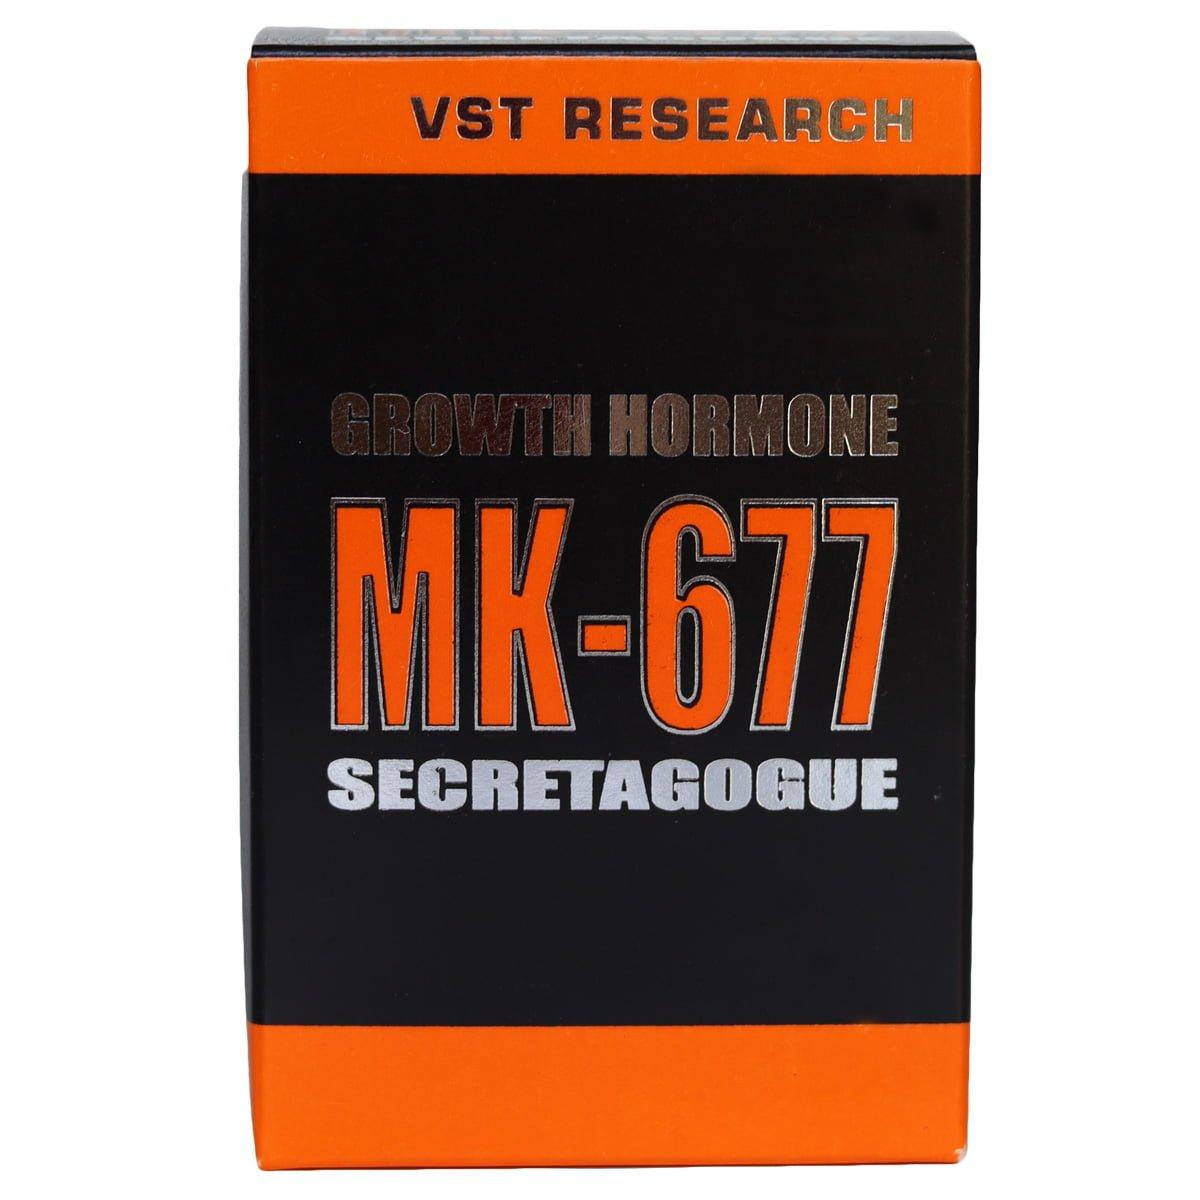 VST research MK677